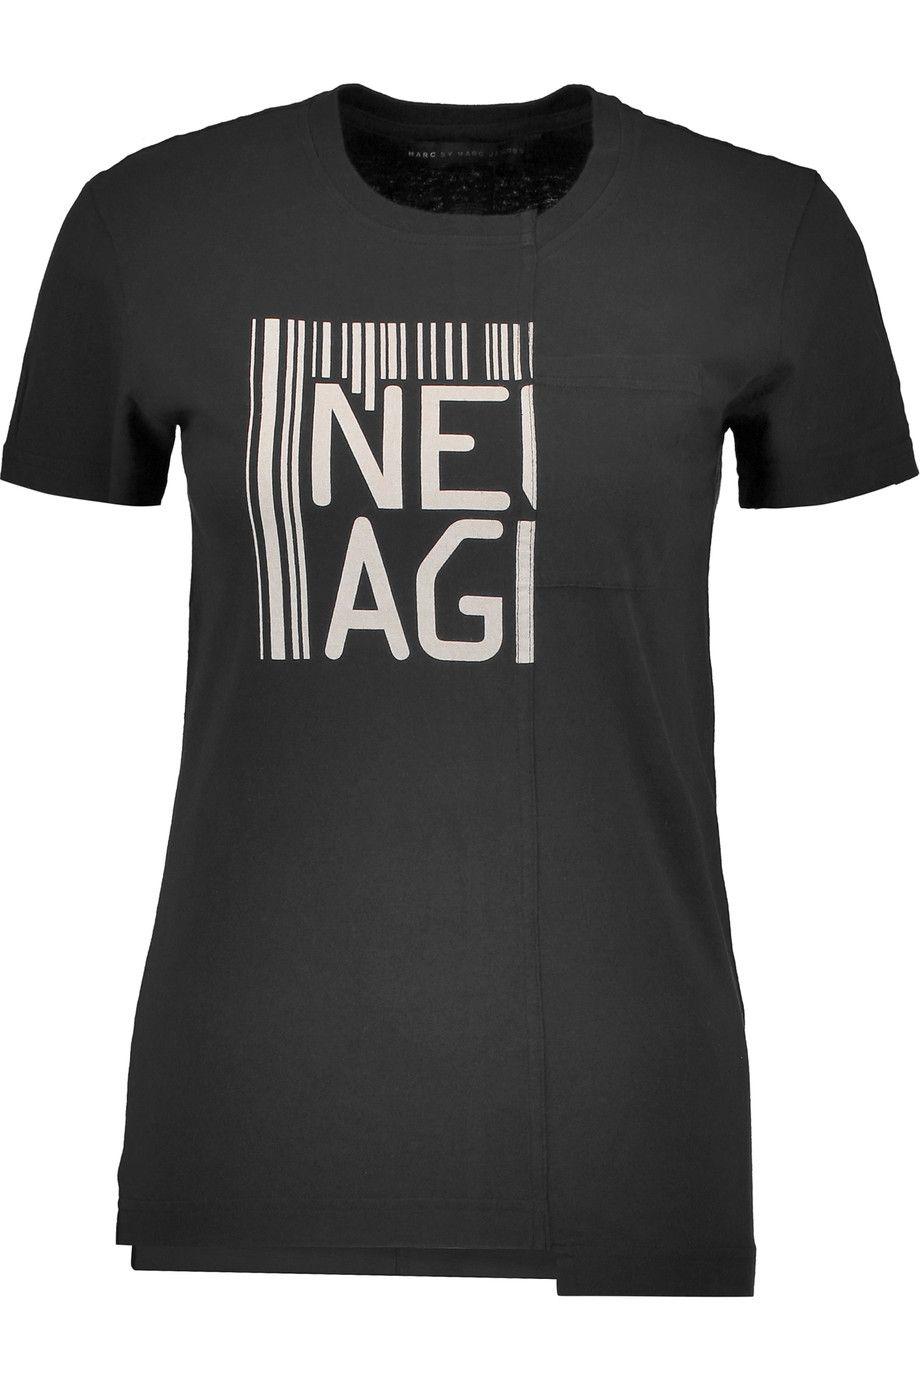 MARC BY MARC JACOBS Printed cotton T-shirt. #marcbymarcjacobs #cloth #t-shirt